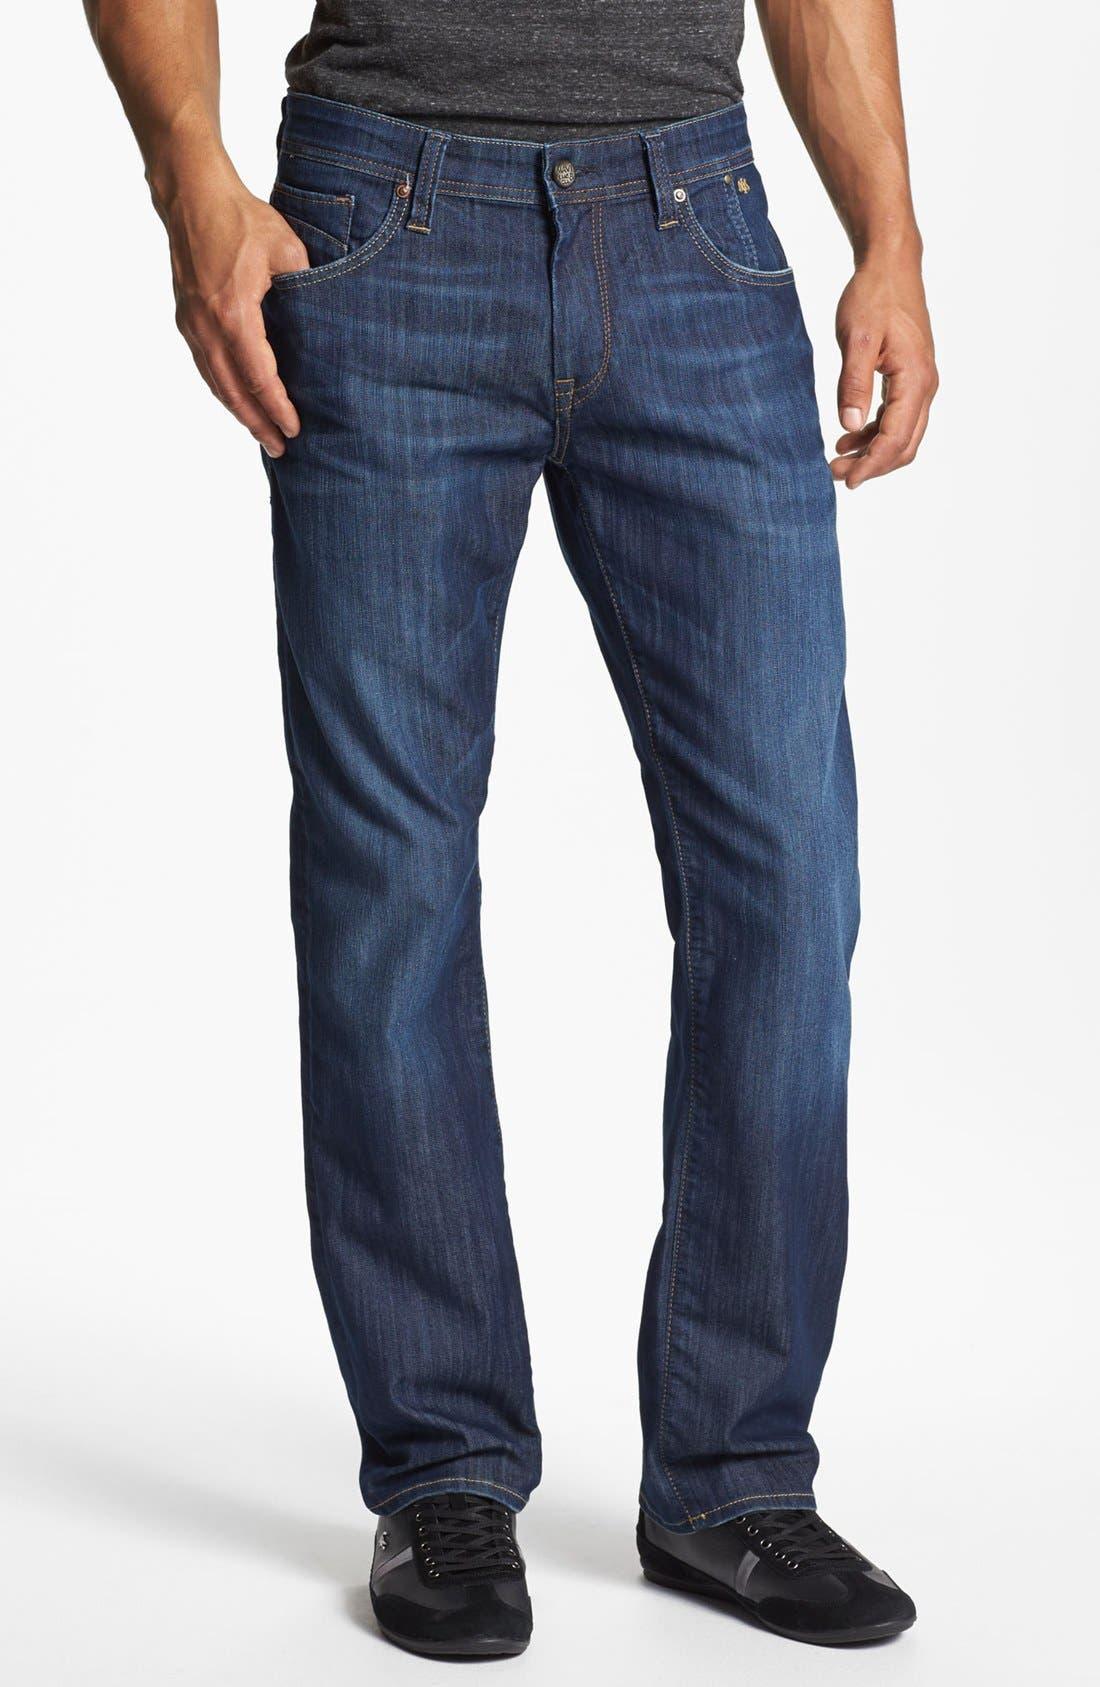 Mavi Jeans 'Zach' Straight Leg Jeans (Dark Maui) (Online Only)